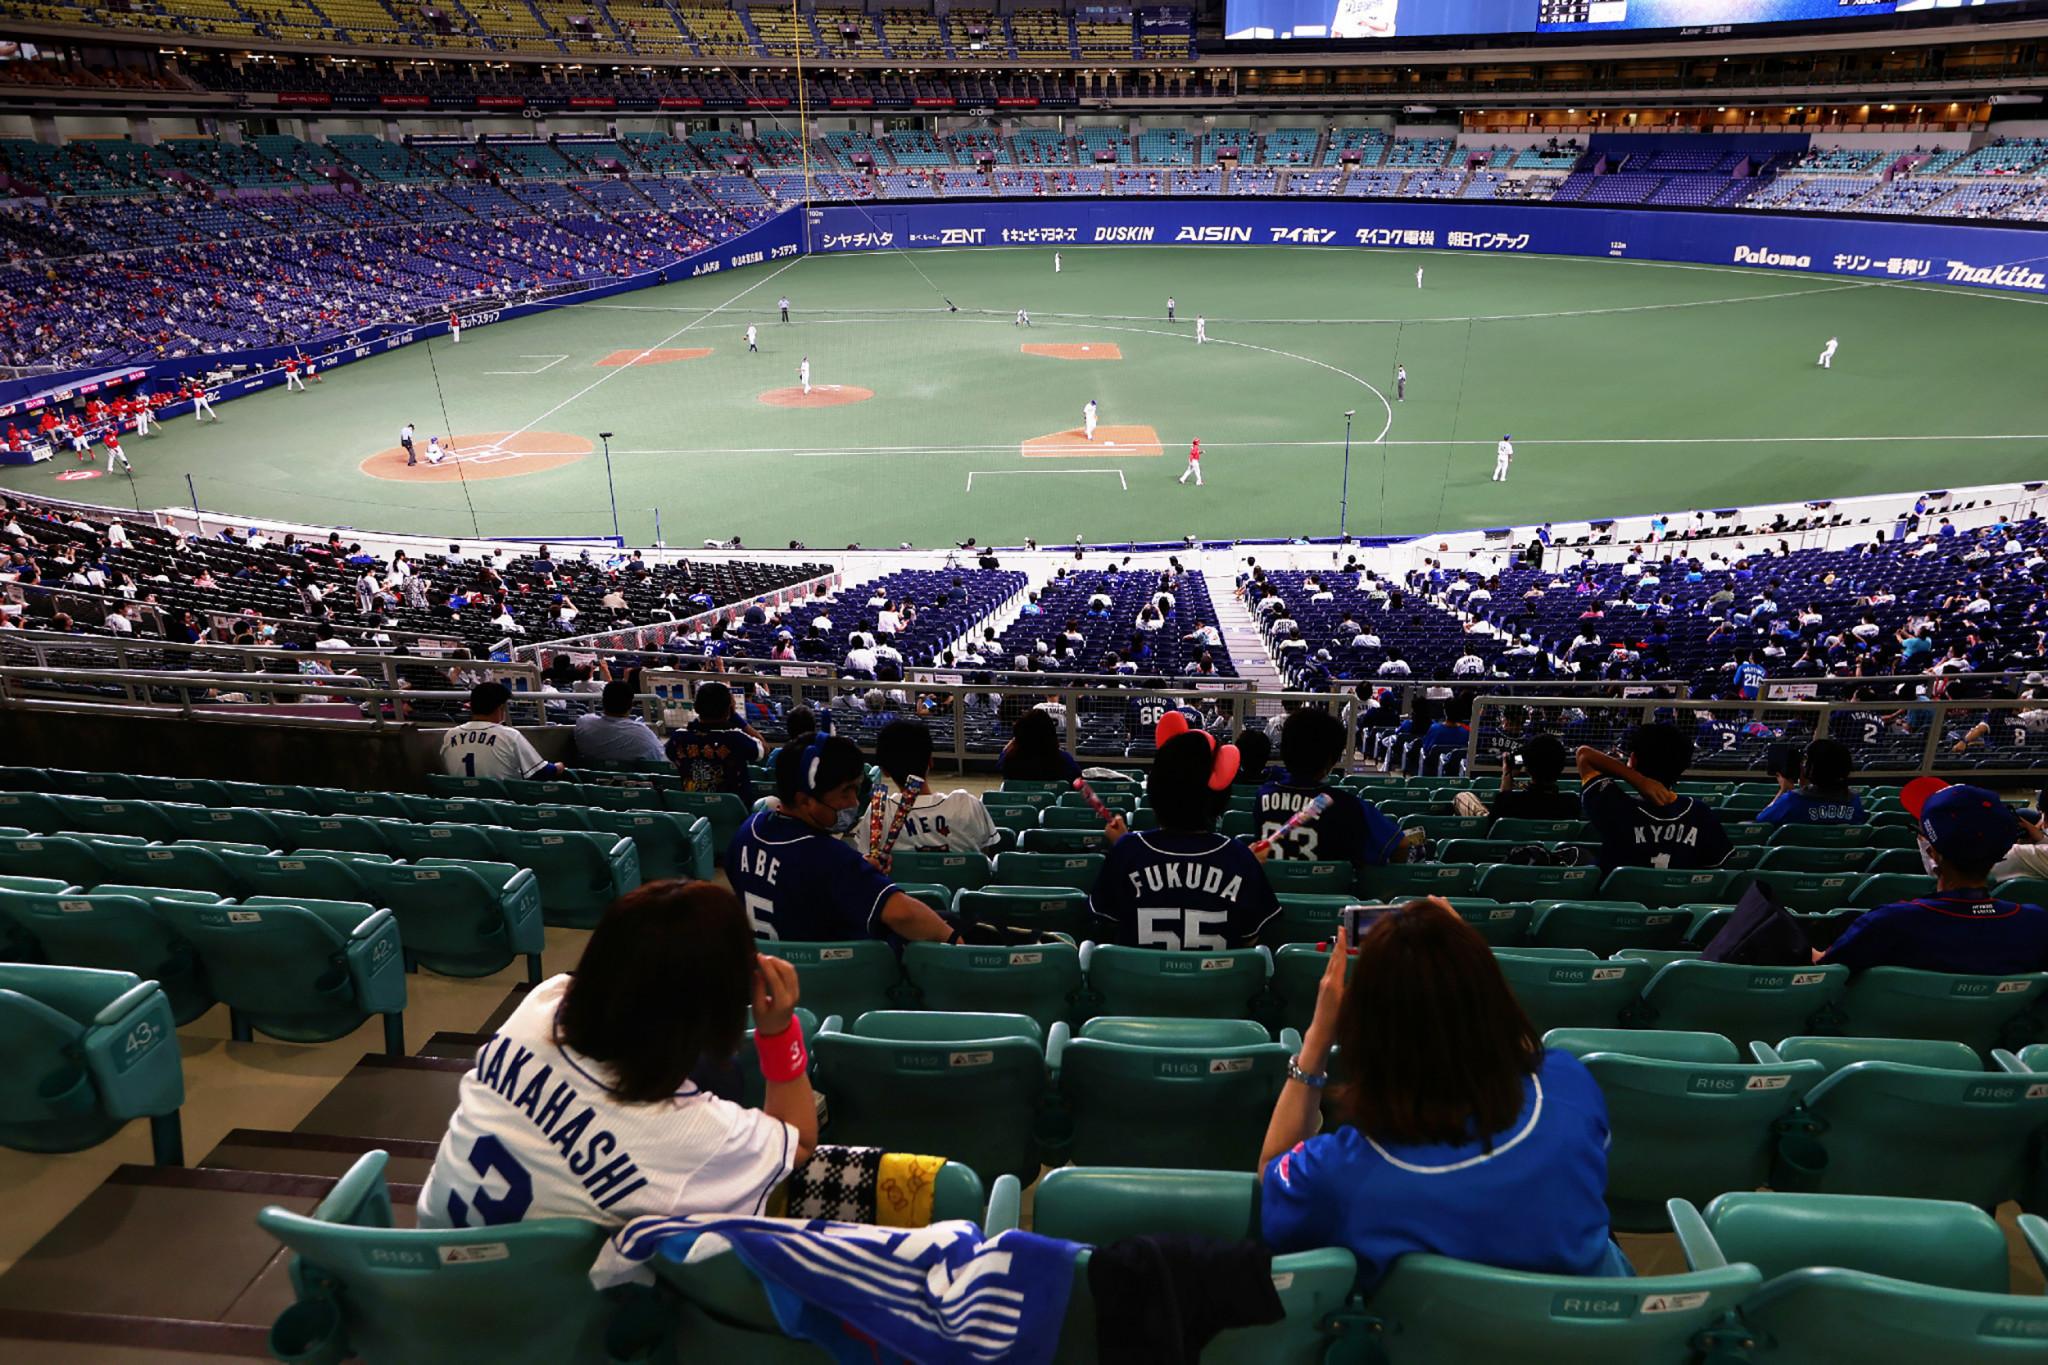 Fans return to stadiums in Japan under precautions as coronavirus cases rise